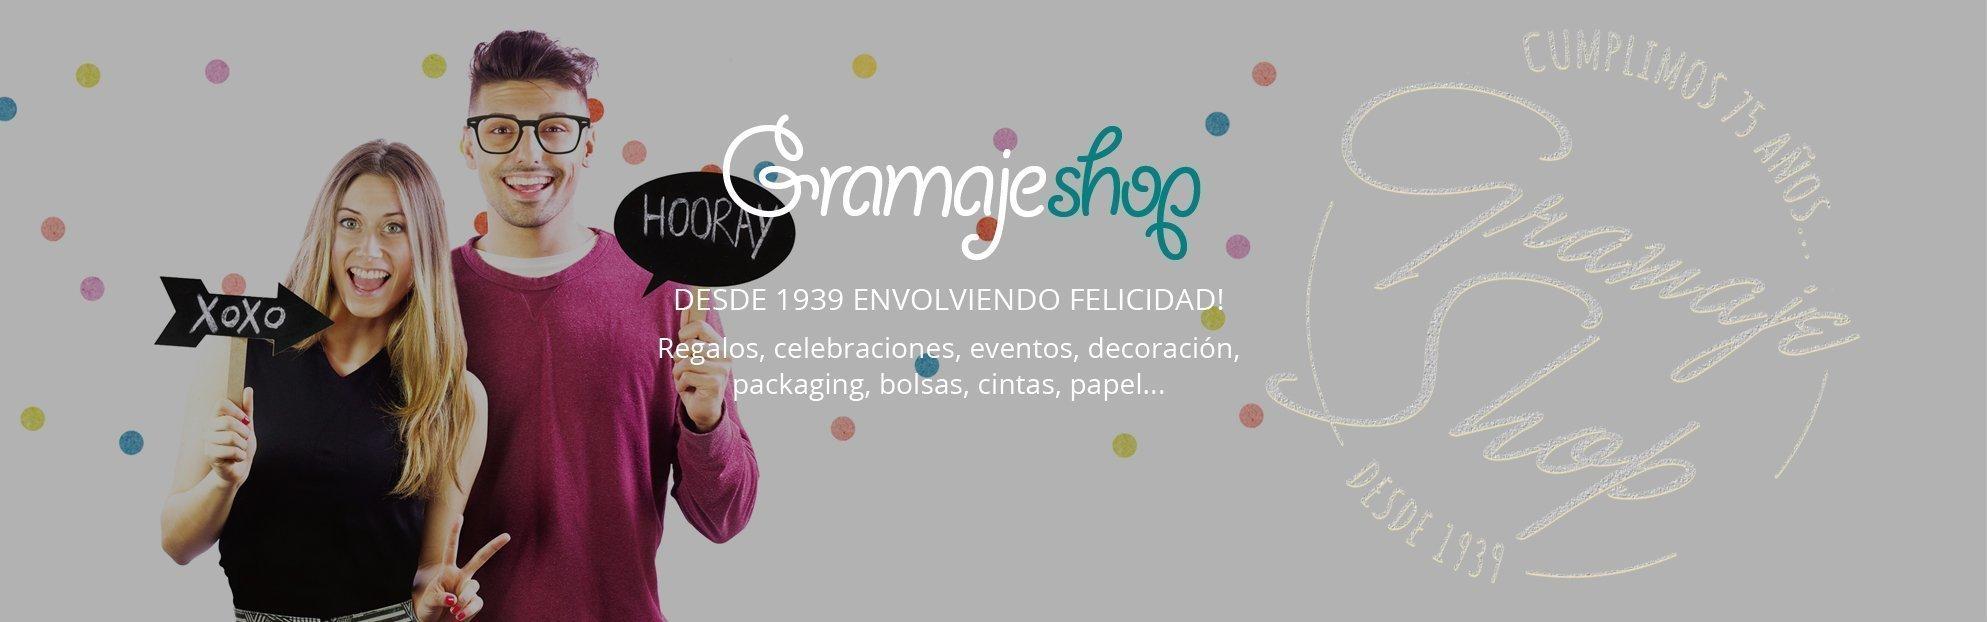 Gramaje Shop